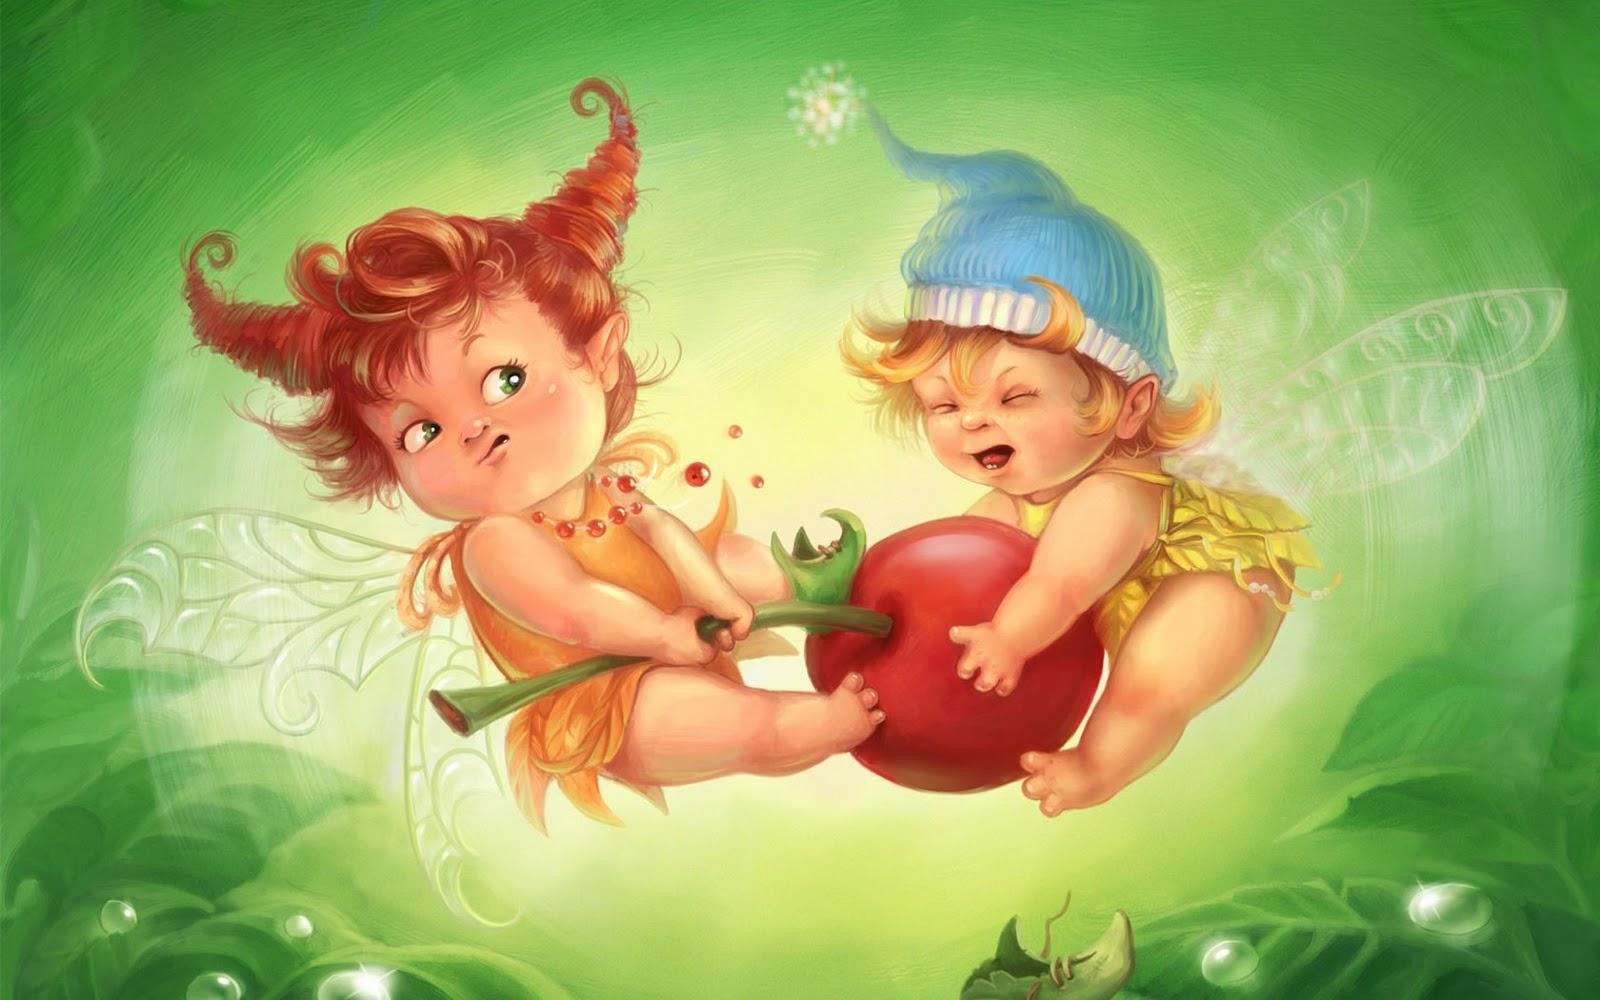 http://4.bp.blogspot.com/-AfKkrXYm-eY/TyQGat-3lAI/AAAAAAAAALo/4hgrJblDZos/s1600/Child+animated+HQ+Wallpaper.jpg